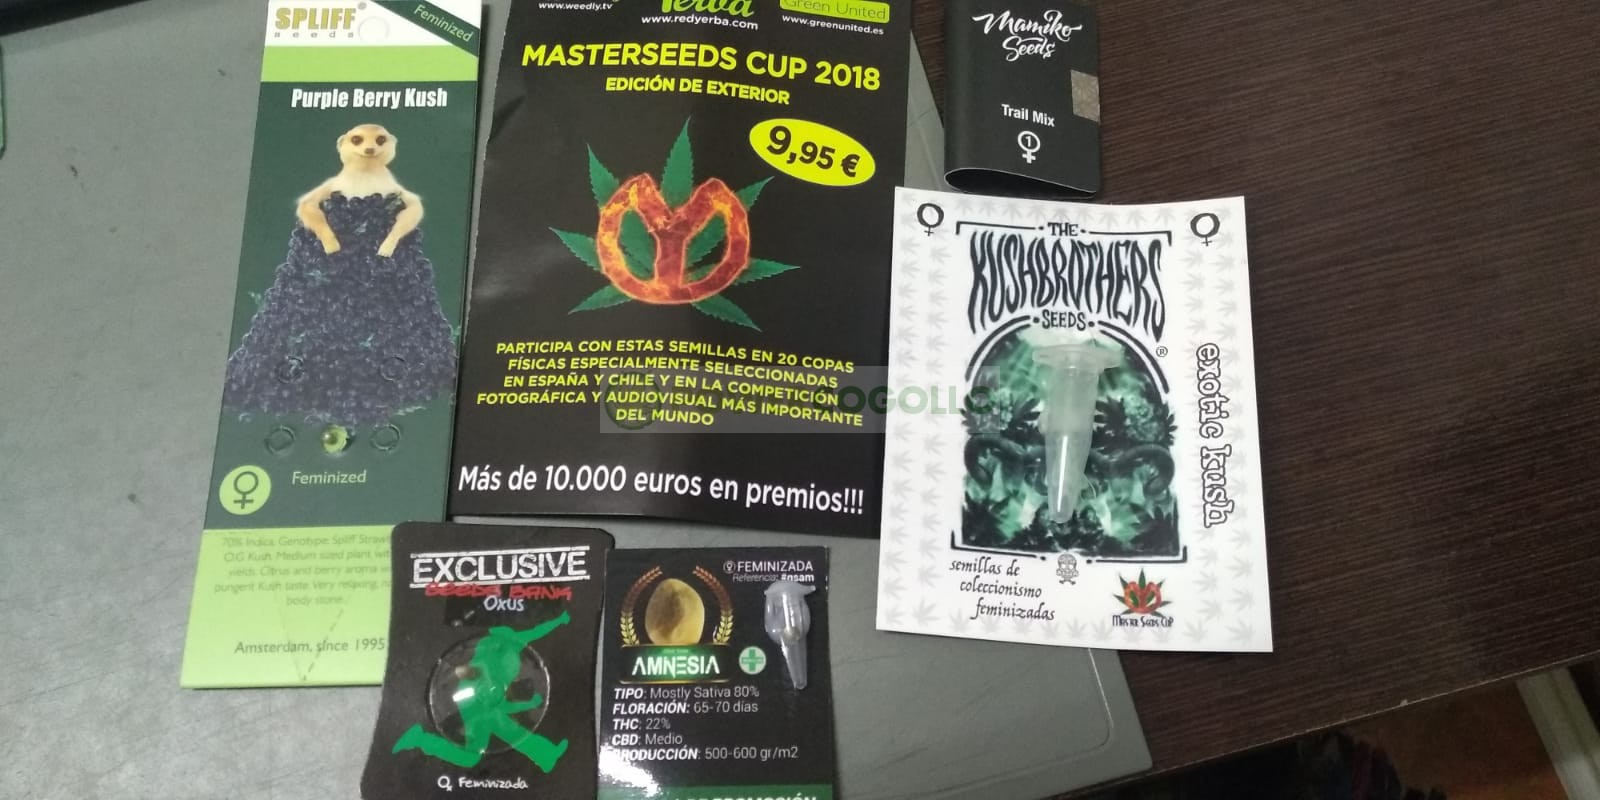 Master Seeds Cup Exterior 2018 (5 Semillas Feminizadas) 0